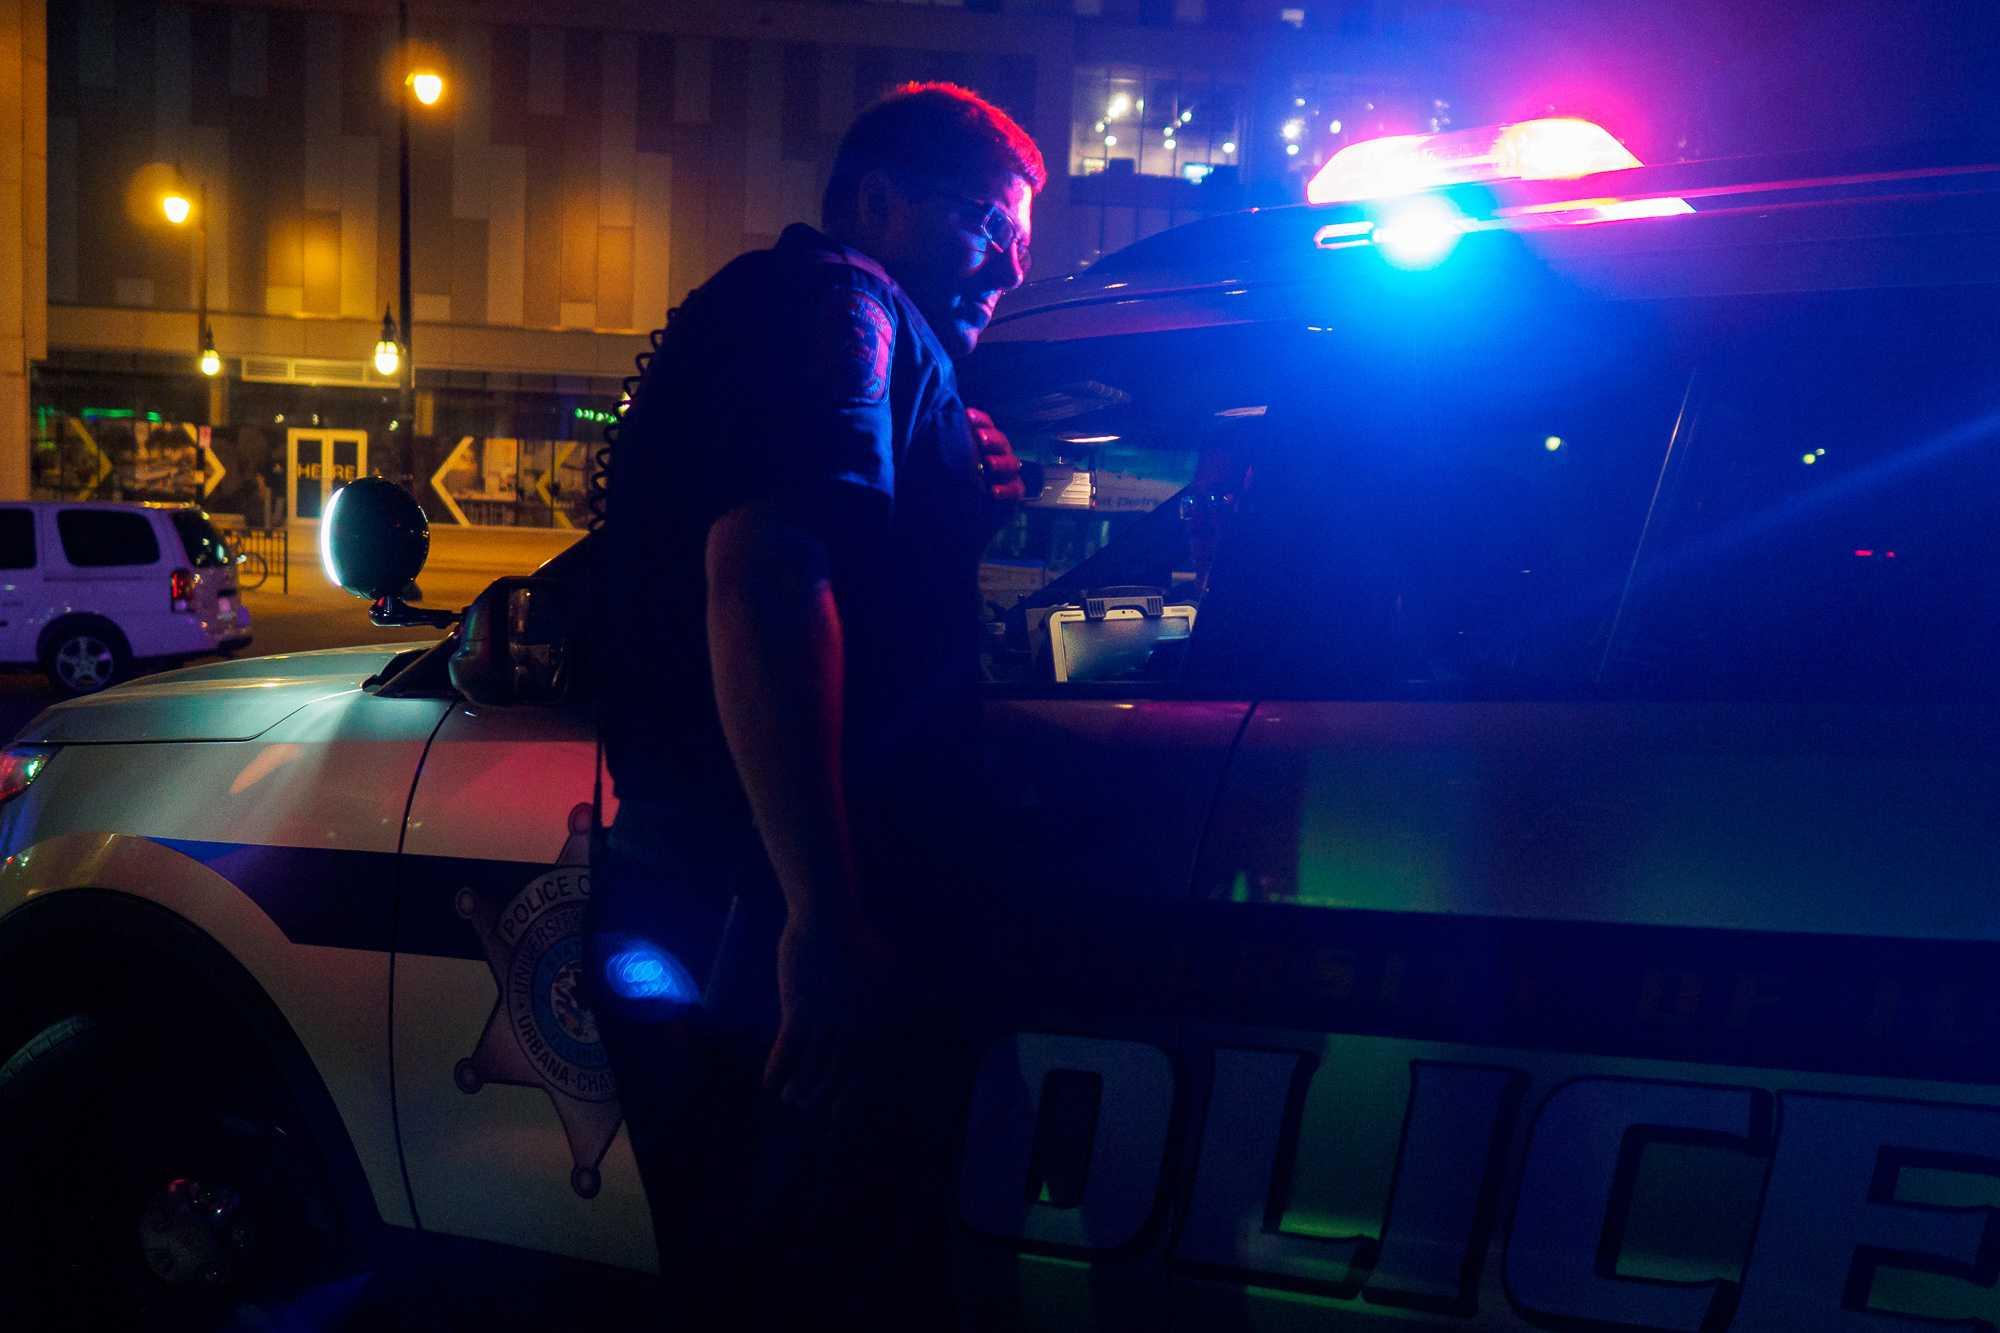 The University of Illinois police on campus.